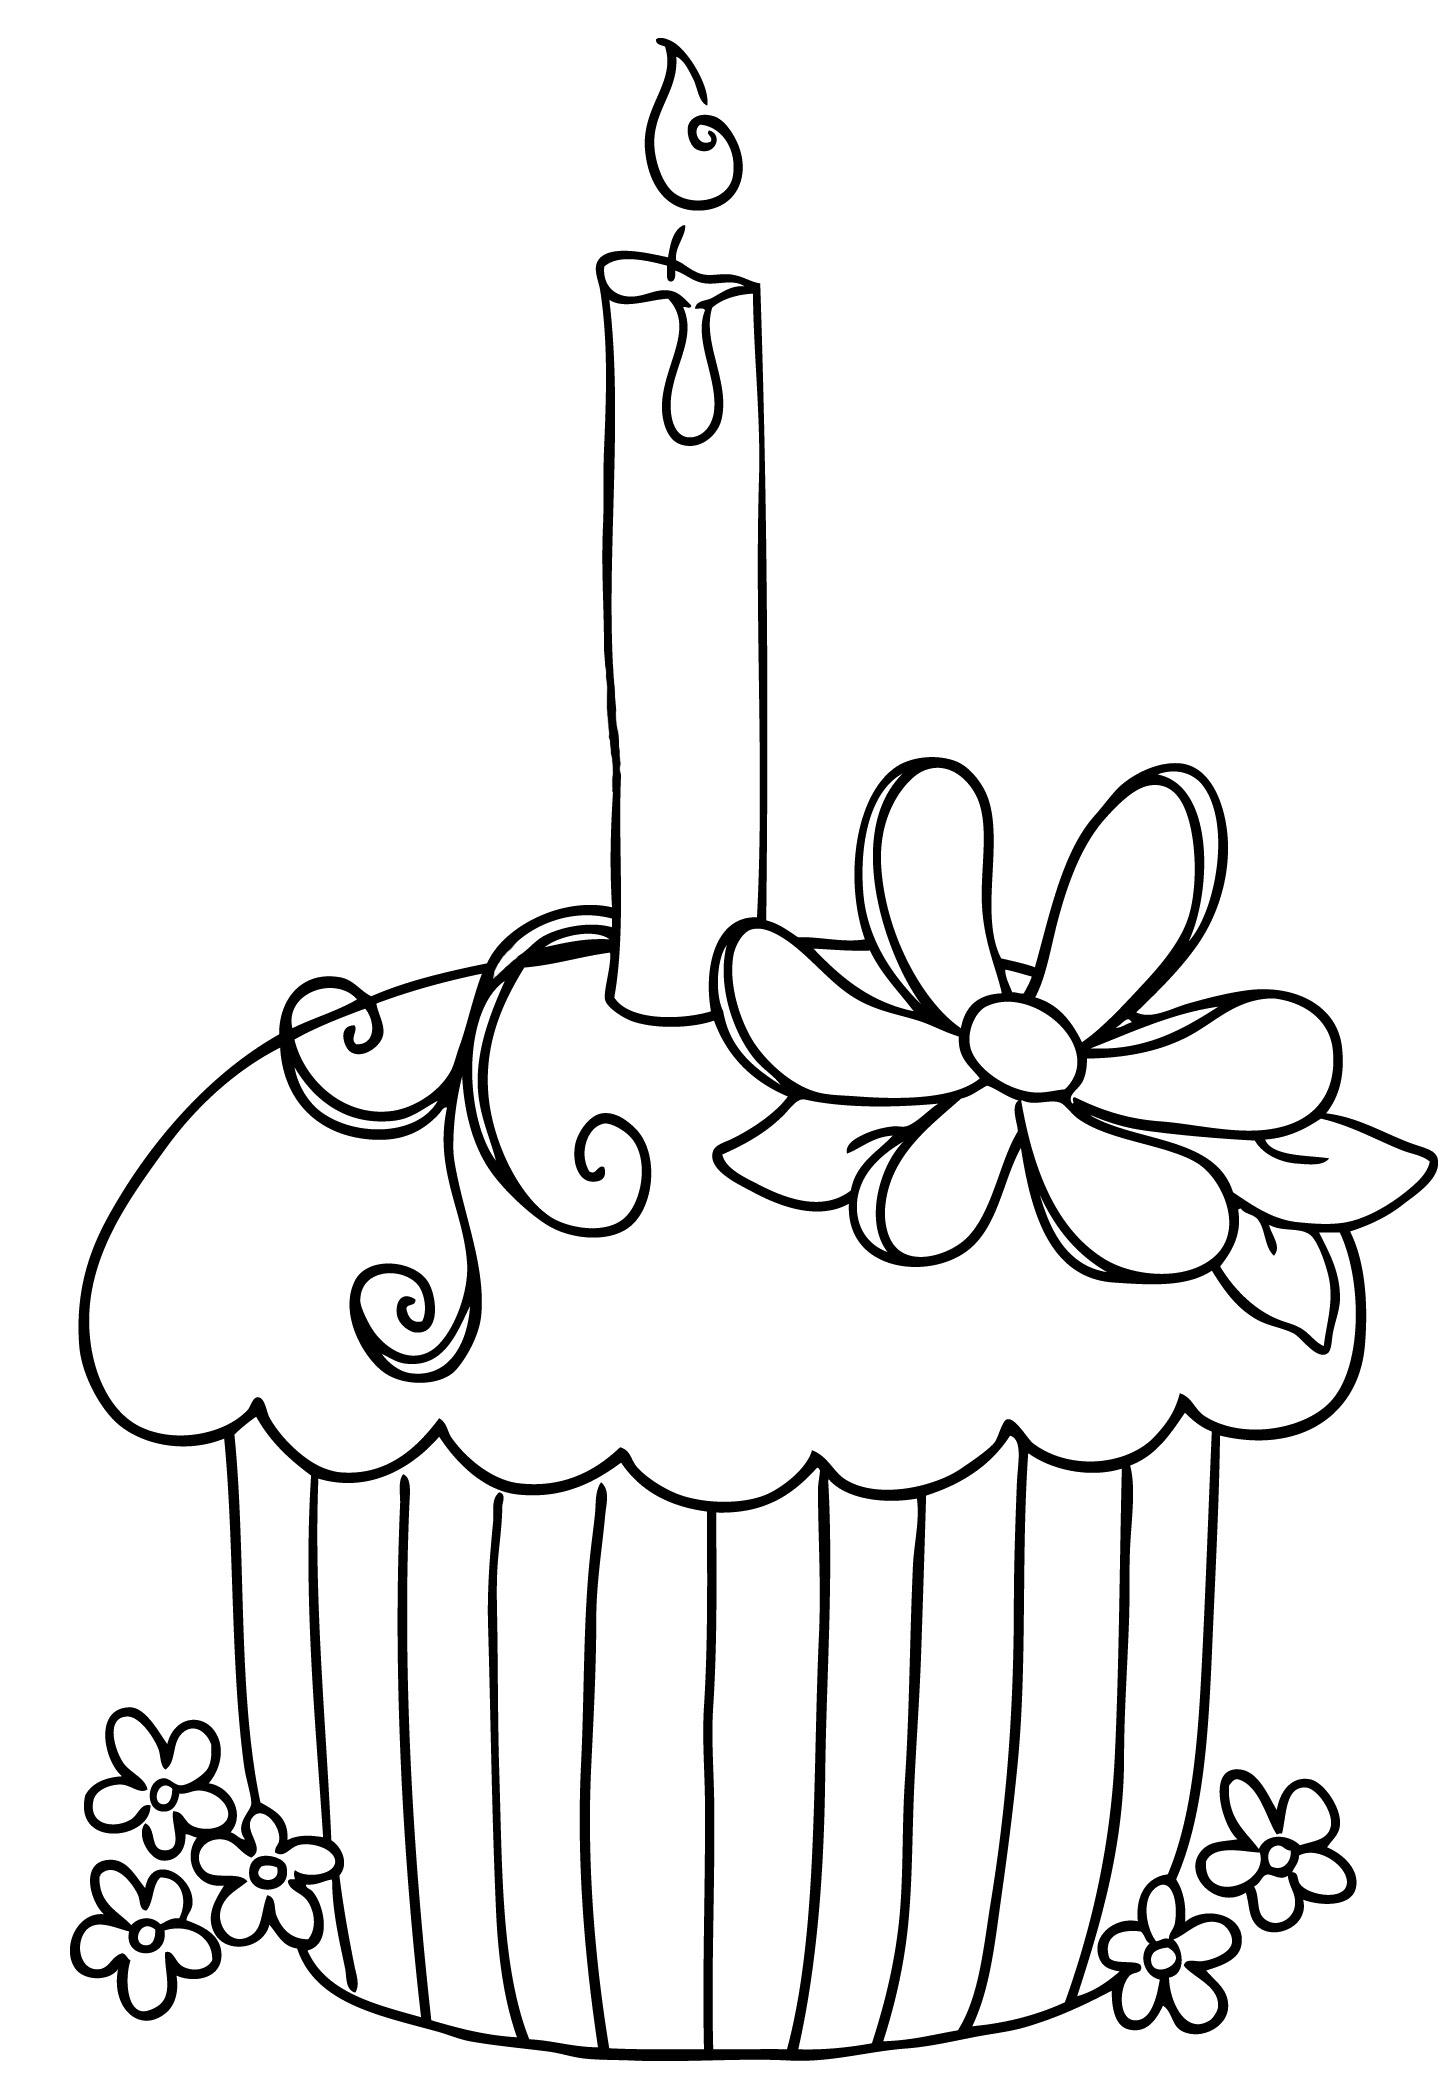 Birthday black and white birthday clipar-Birthday black and white birthday clipart black and white-14